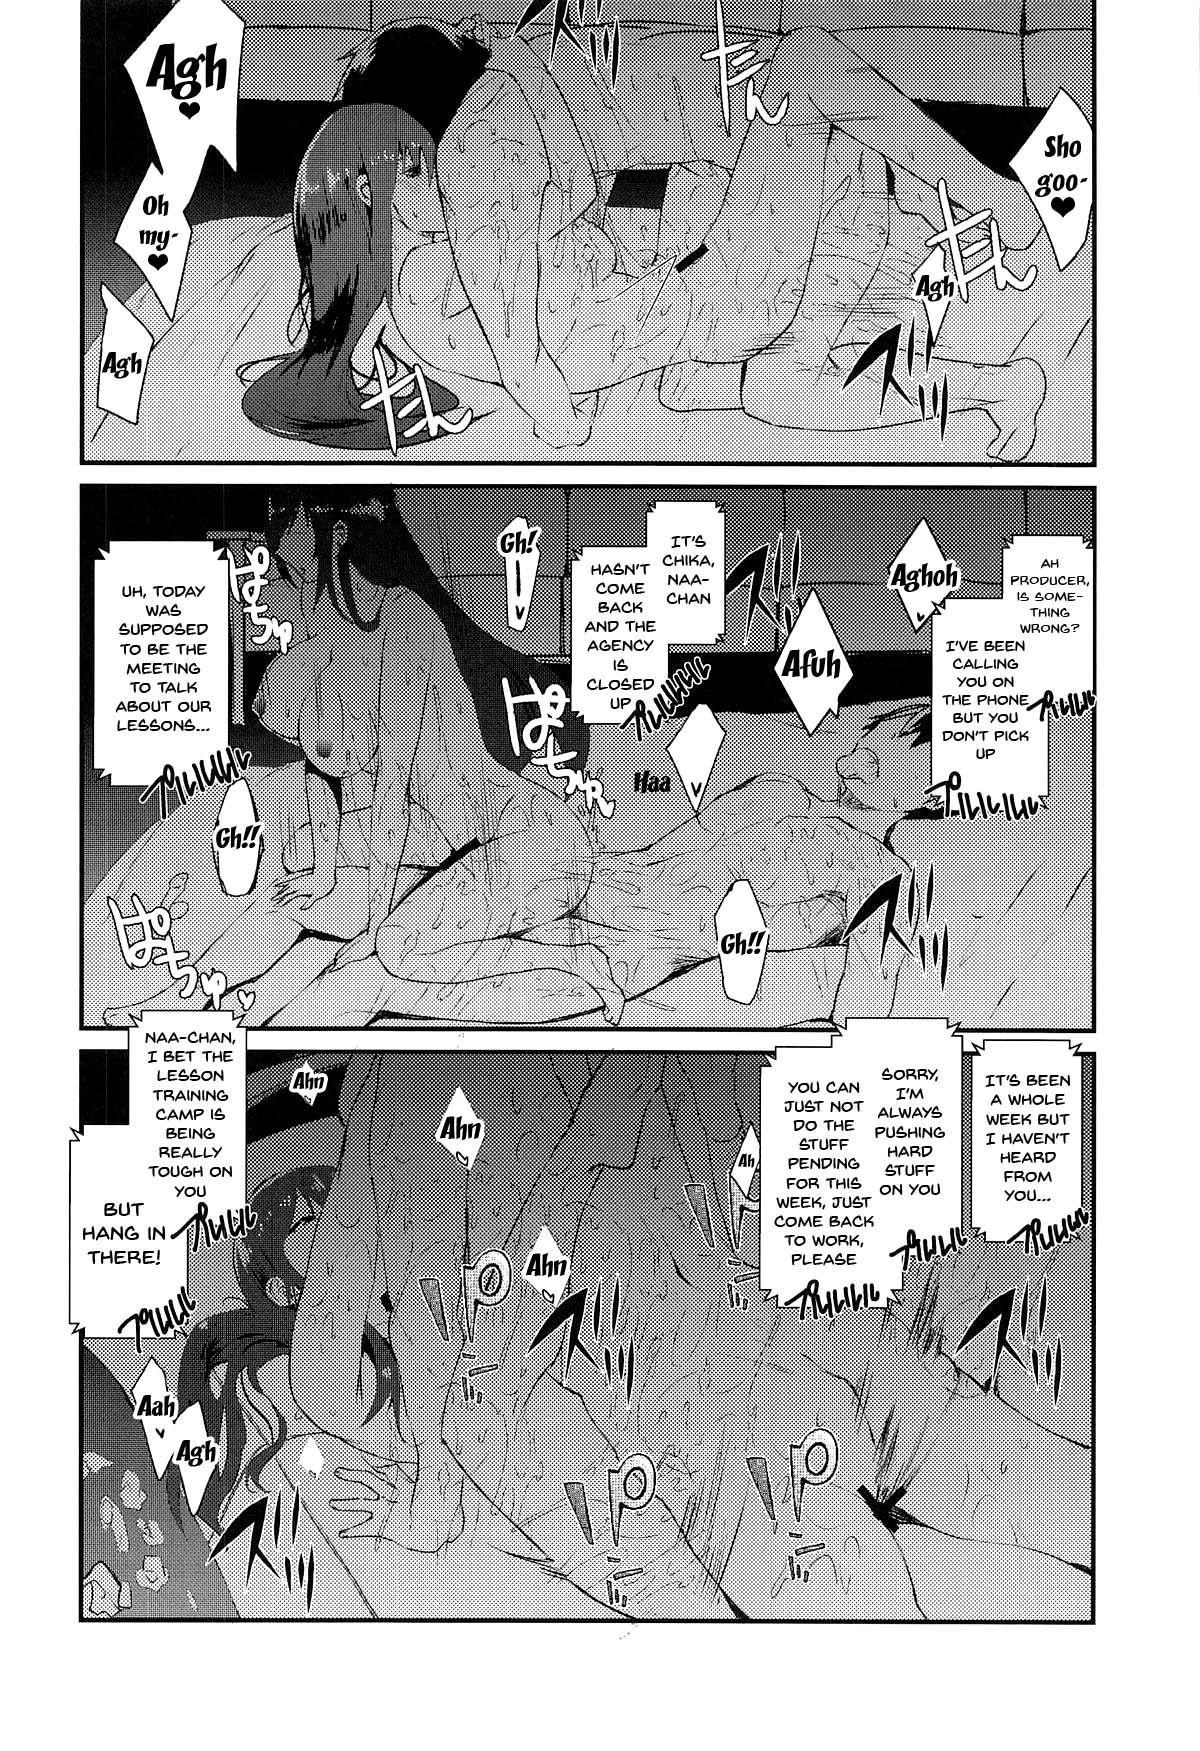 Osaki Amana ni Semerare H Sareru Hon. | A Book About Being Teased 18